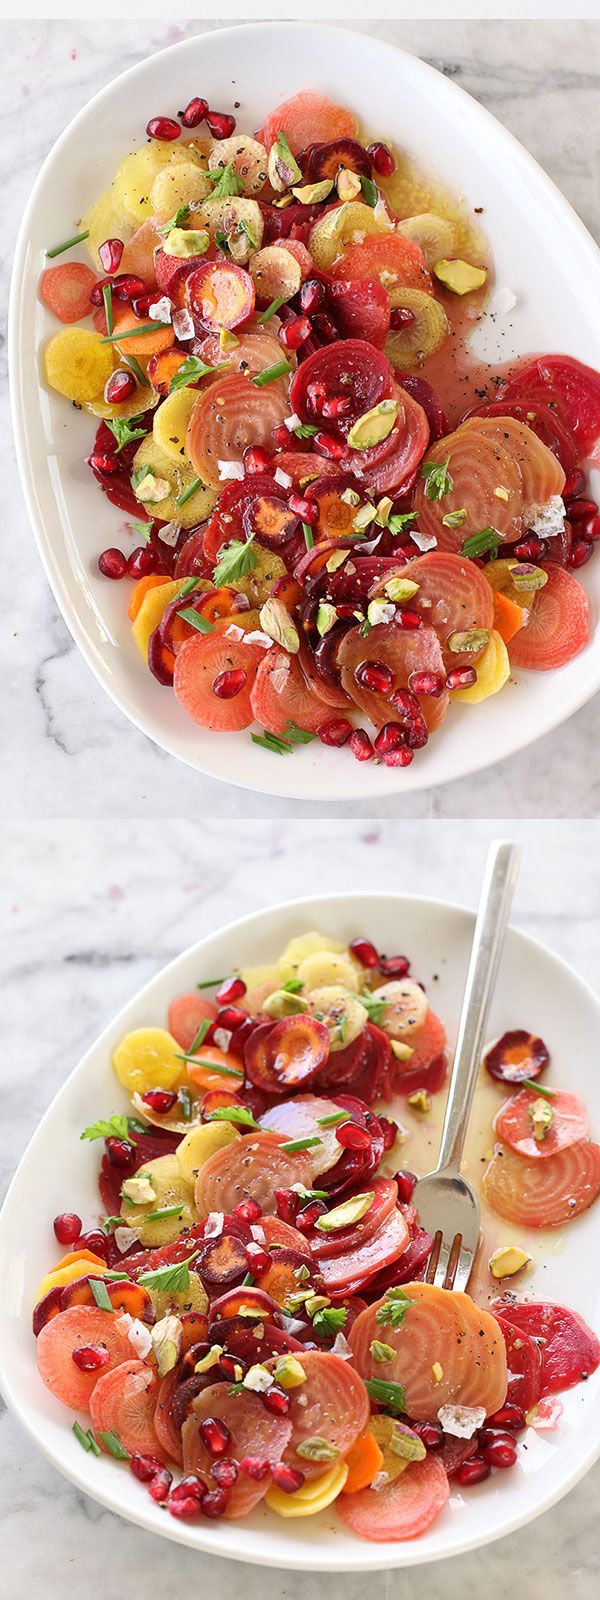 The 25+ best Pomegranate salad ideas on Pinterest ...